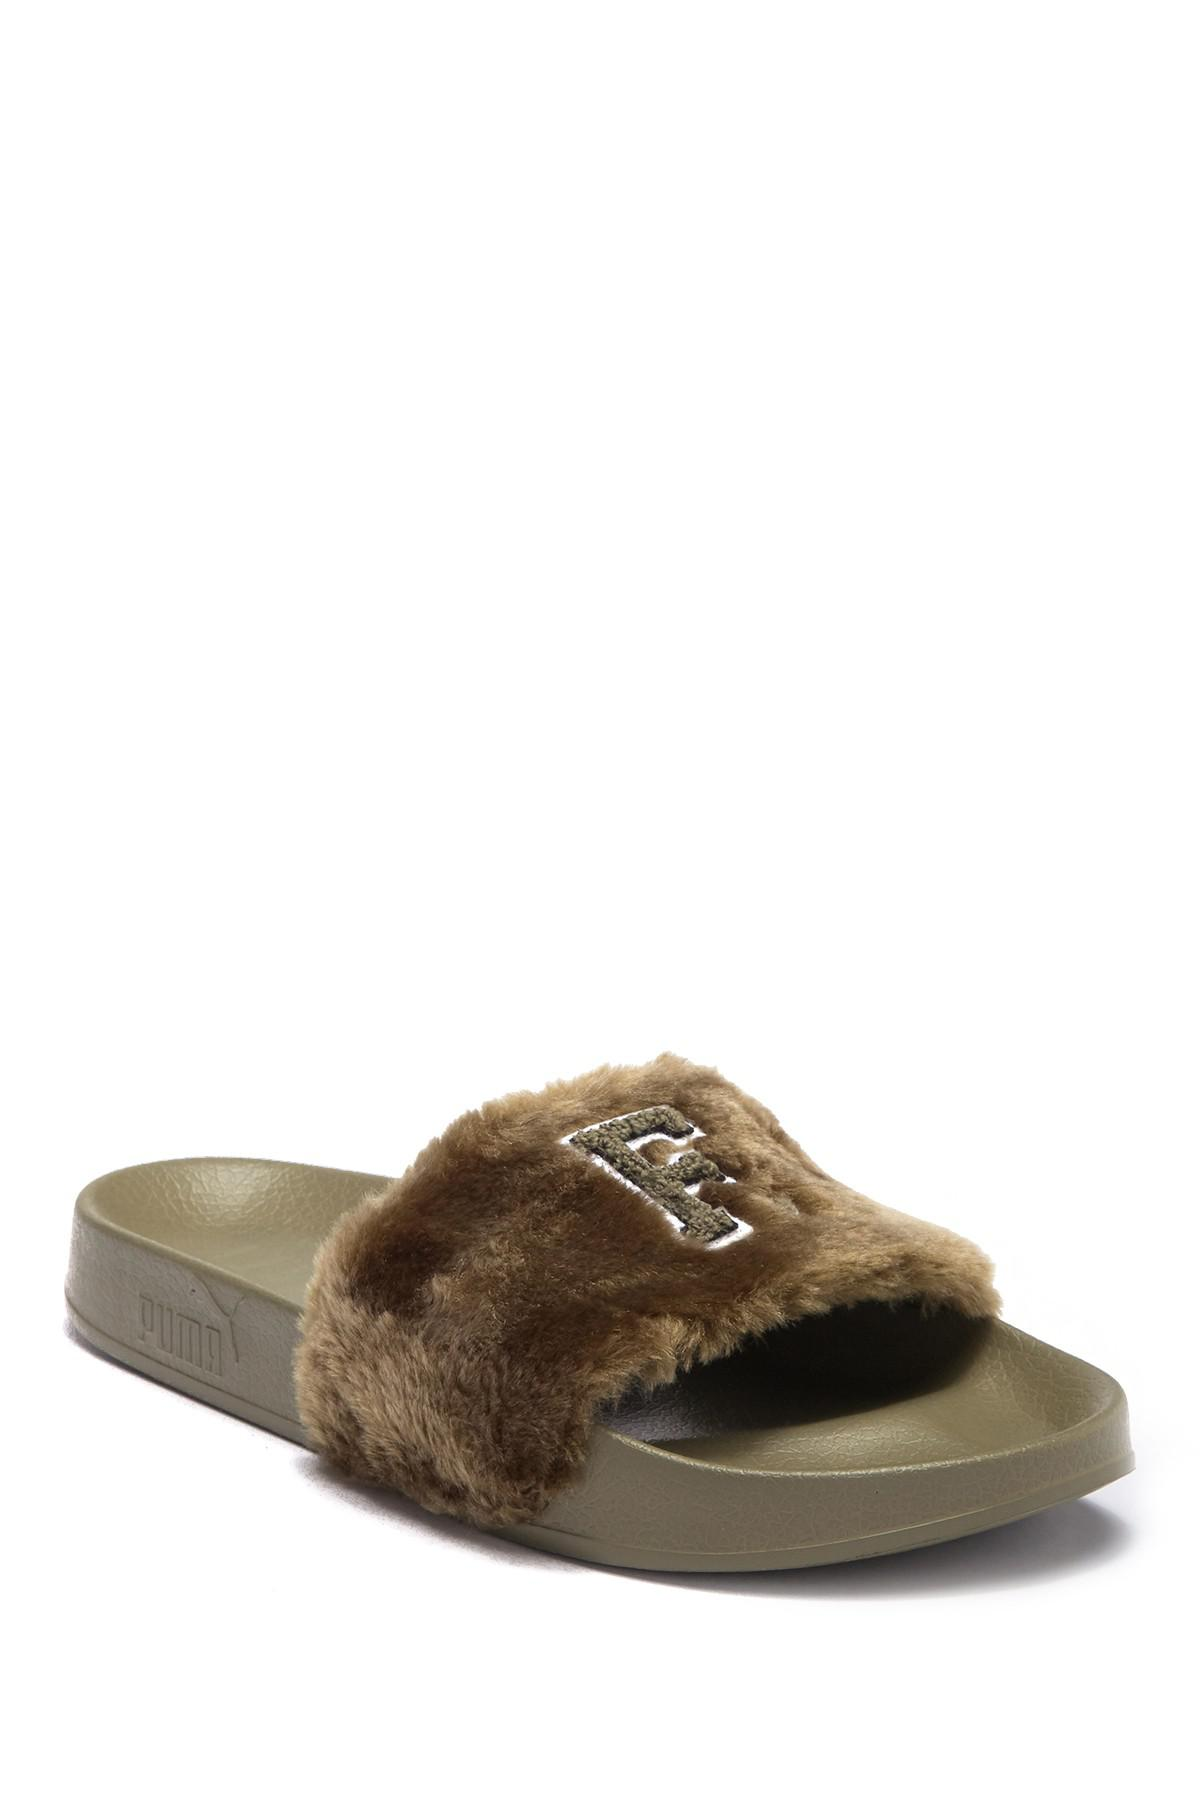 26c5506abfe2 Lyst - Puma Fenty By Rihanna Faux Fur Leadcat Slide Sandal in Green ...